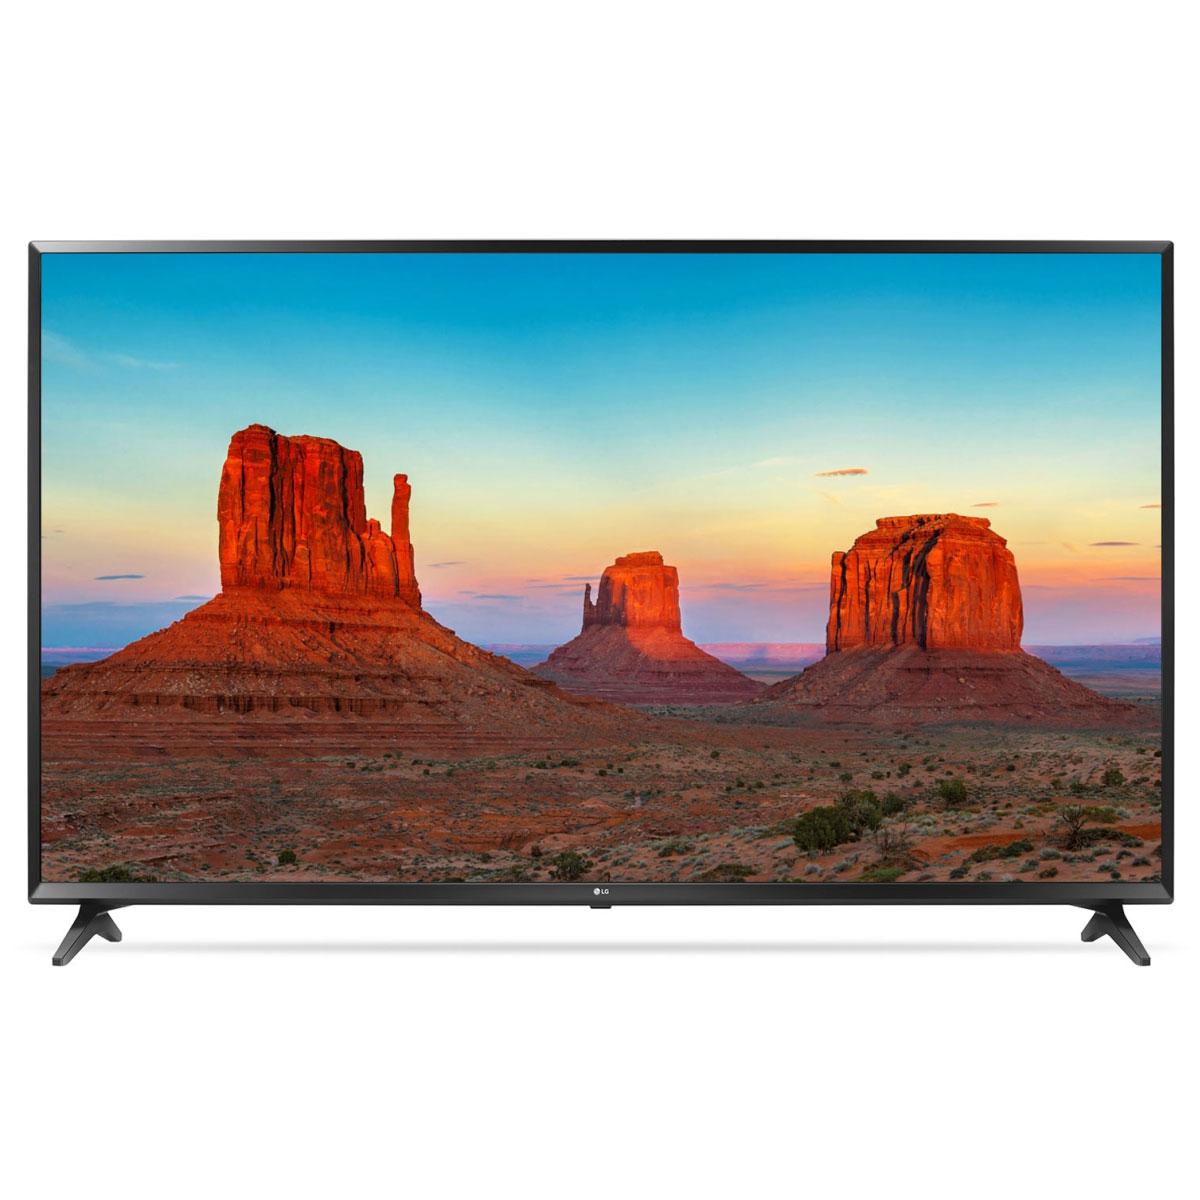 "TV LG 55UK6100 Téléviseur LED 4K 55"" (140 cm) 16/9 - 3840 x 2160 pixels - Ultra HD 2160p - HDR - Wi-Fi - Bluetooth - DLNA - 1600 Hz"